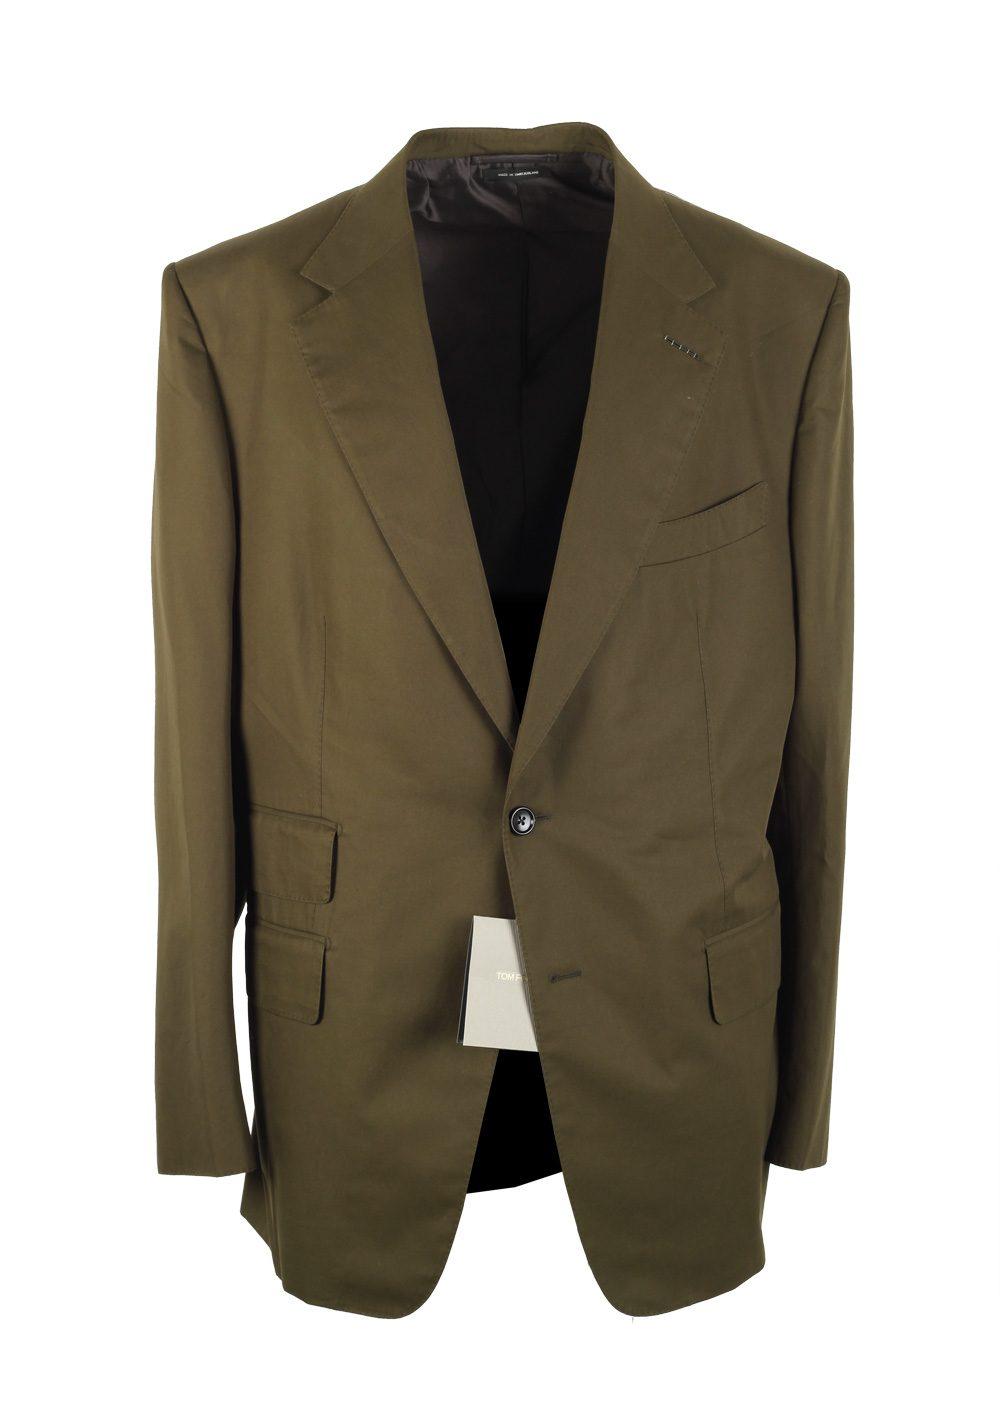 TOM FORD Windsor Green Suit Size 58 / 48R U.S. Cotton Fit A | Costume Limité